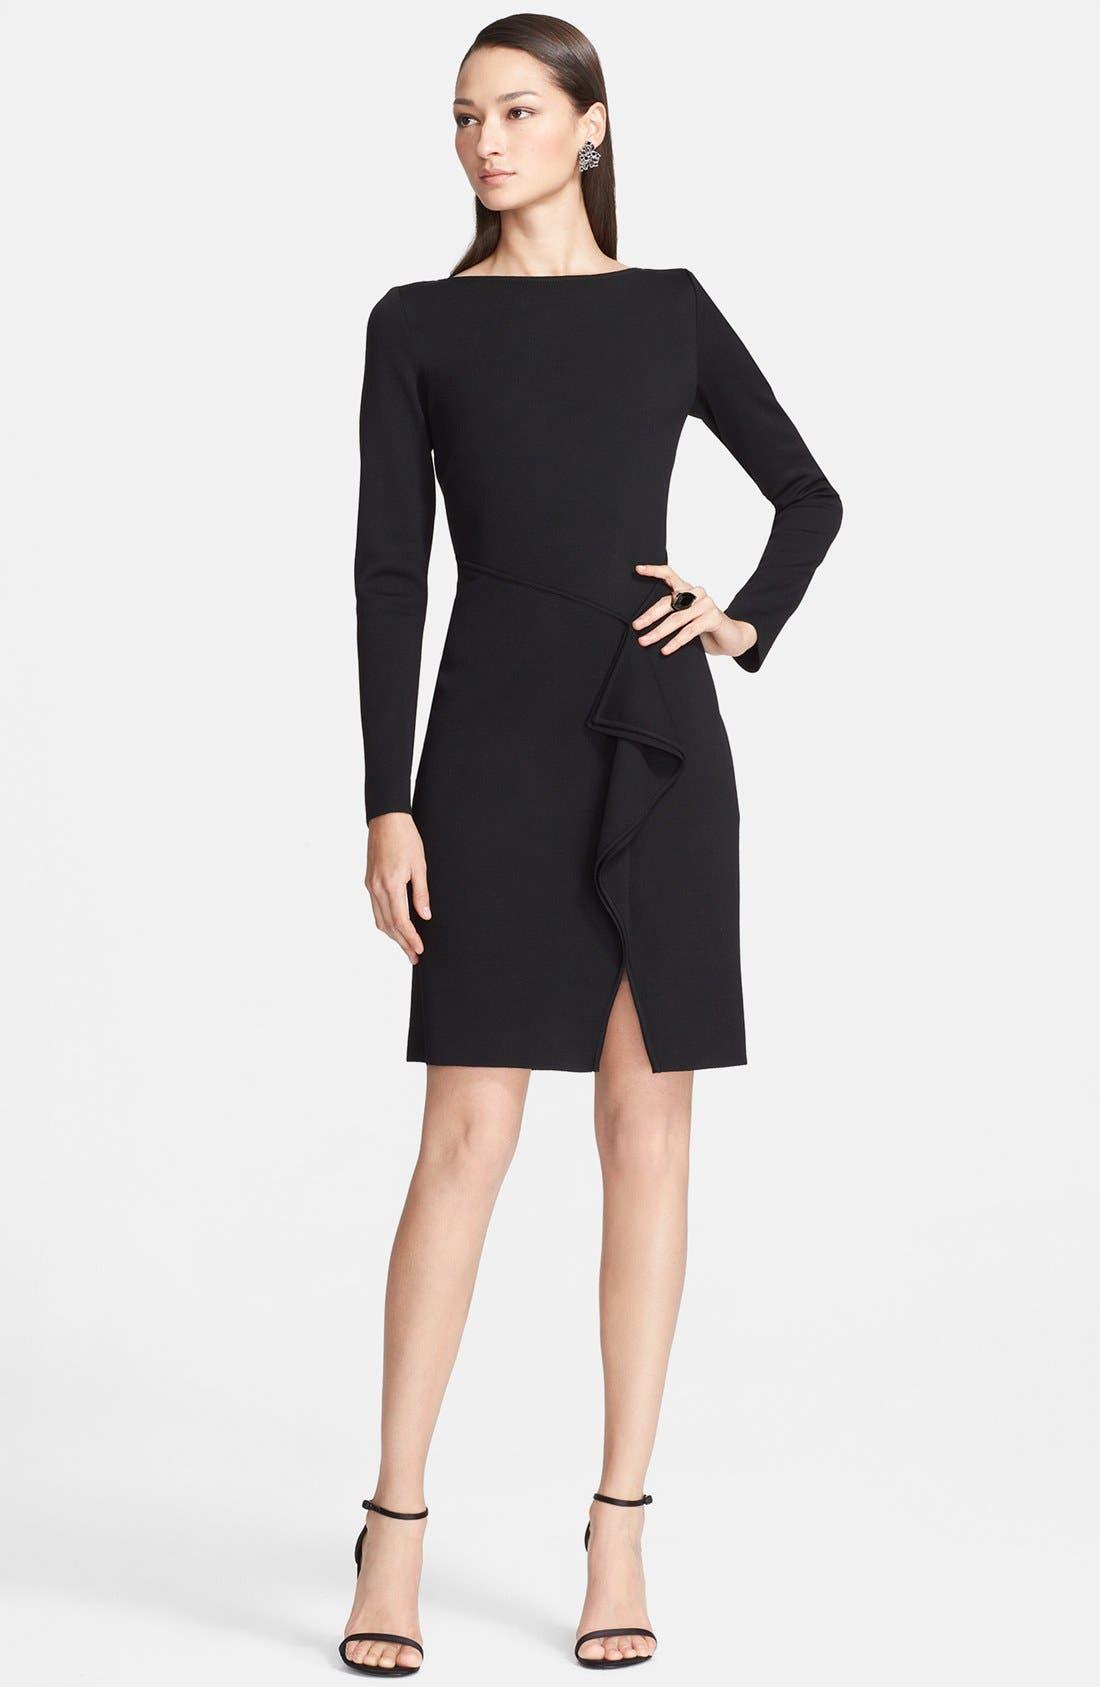 Main Image - St. John Collection Bateau Neck Drape Front Milano Knit Dress